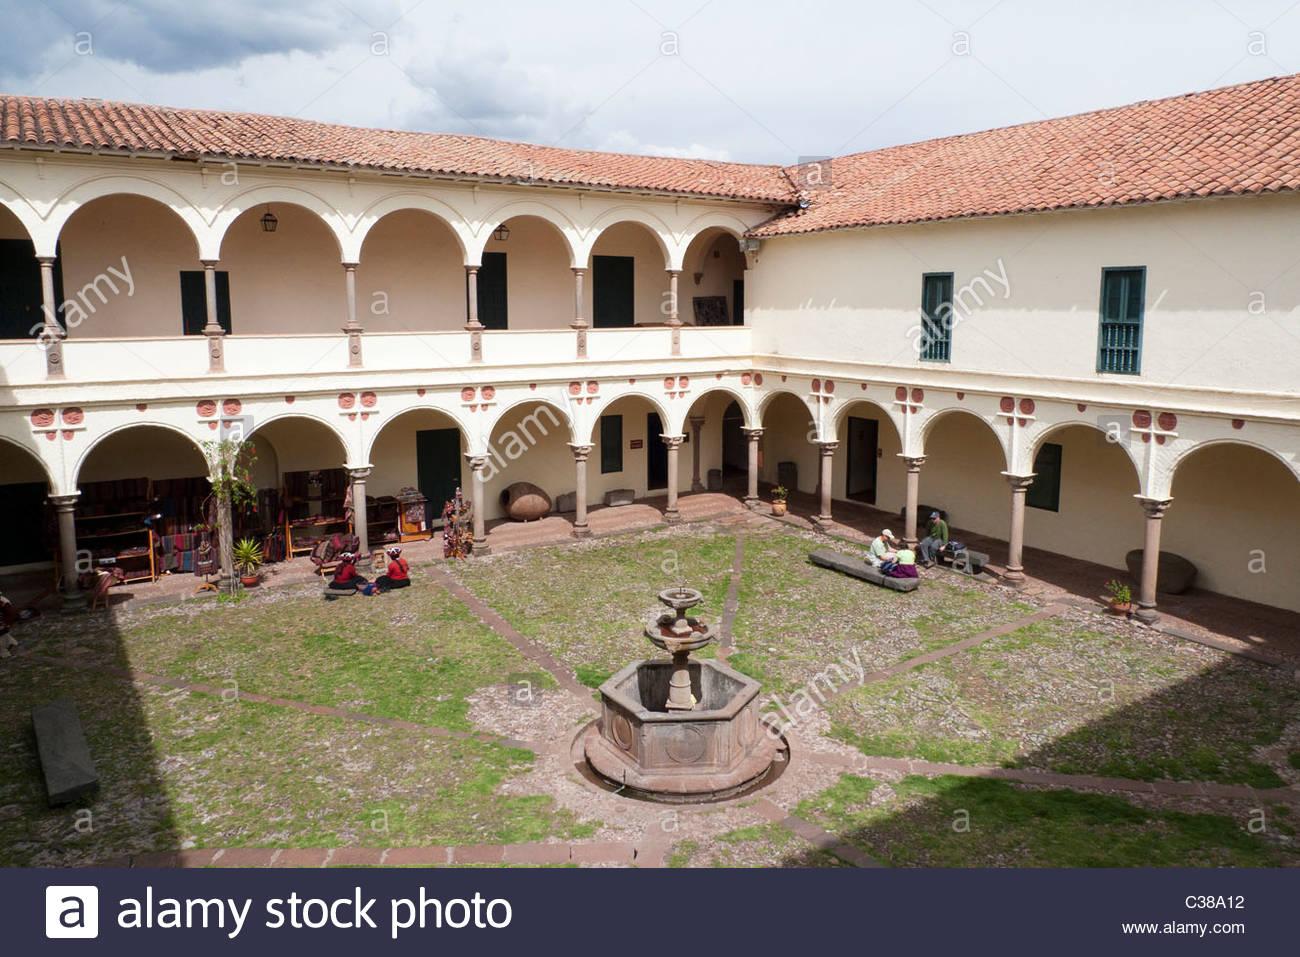 Colonial courtyard of Museo Inka (Inca Museum) in Cusco, Peru. - Stock Image